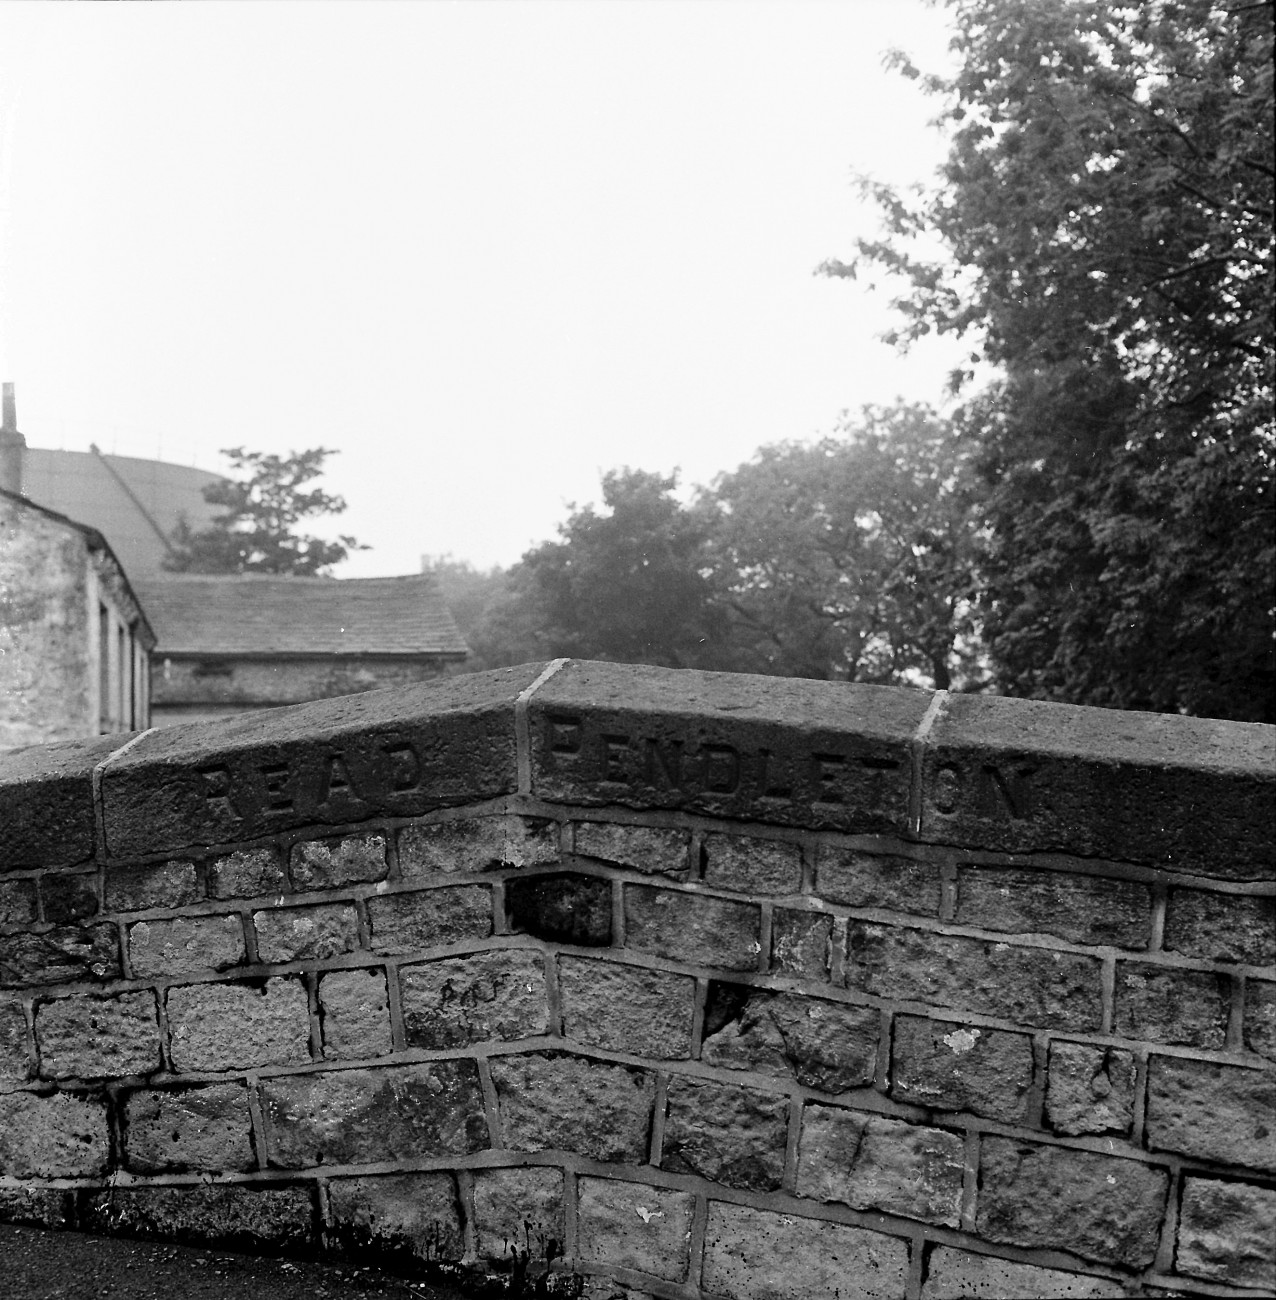 This Old Bridge Records Birth of Sabden Parish (1 of 4)